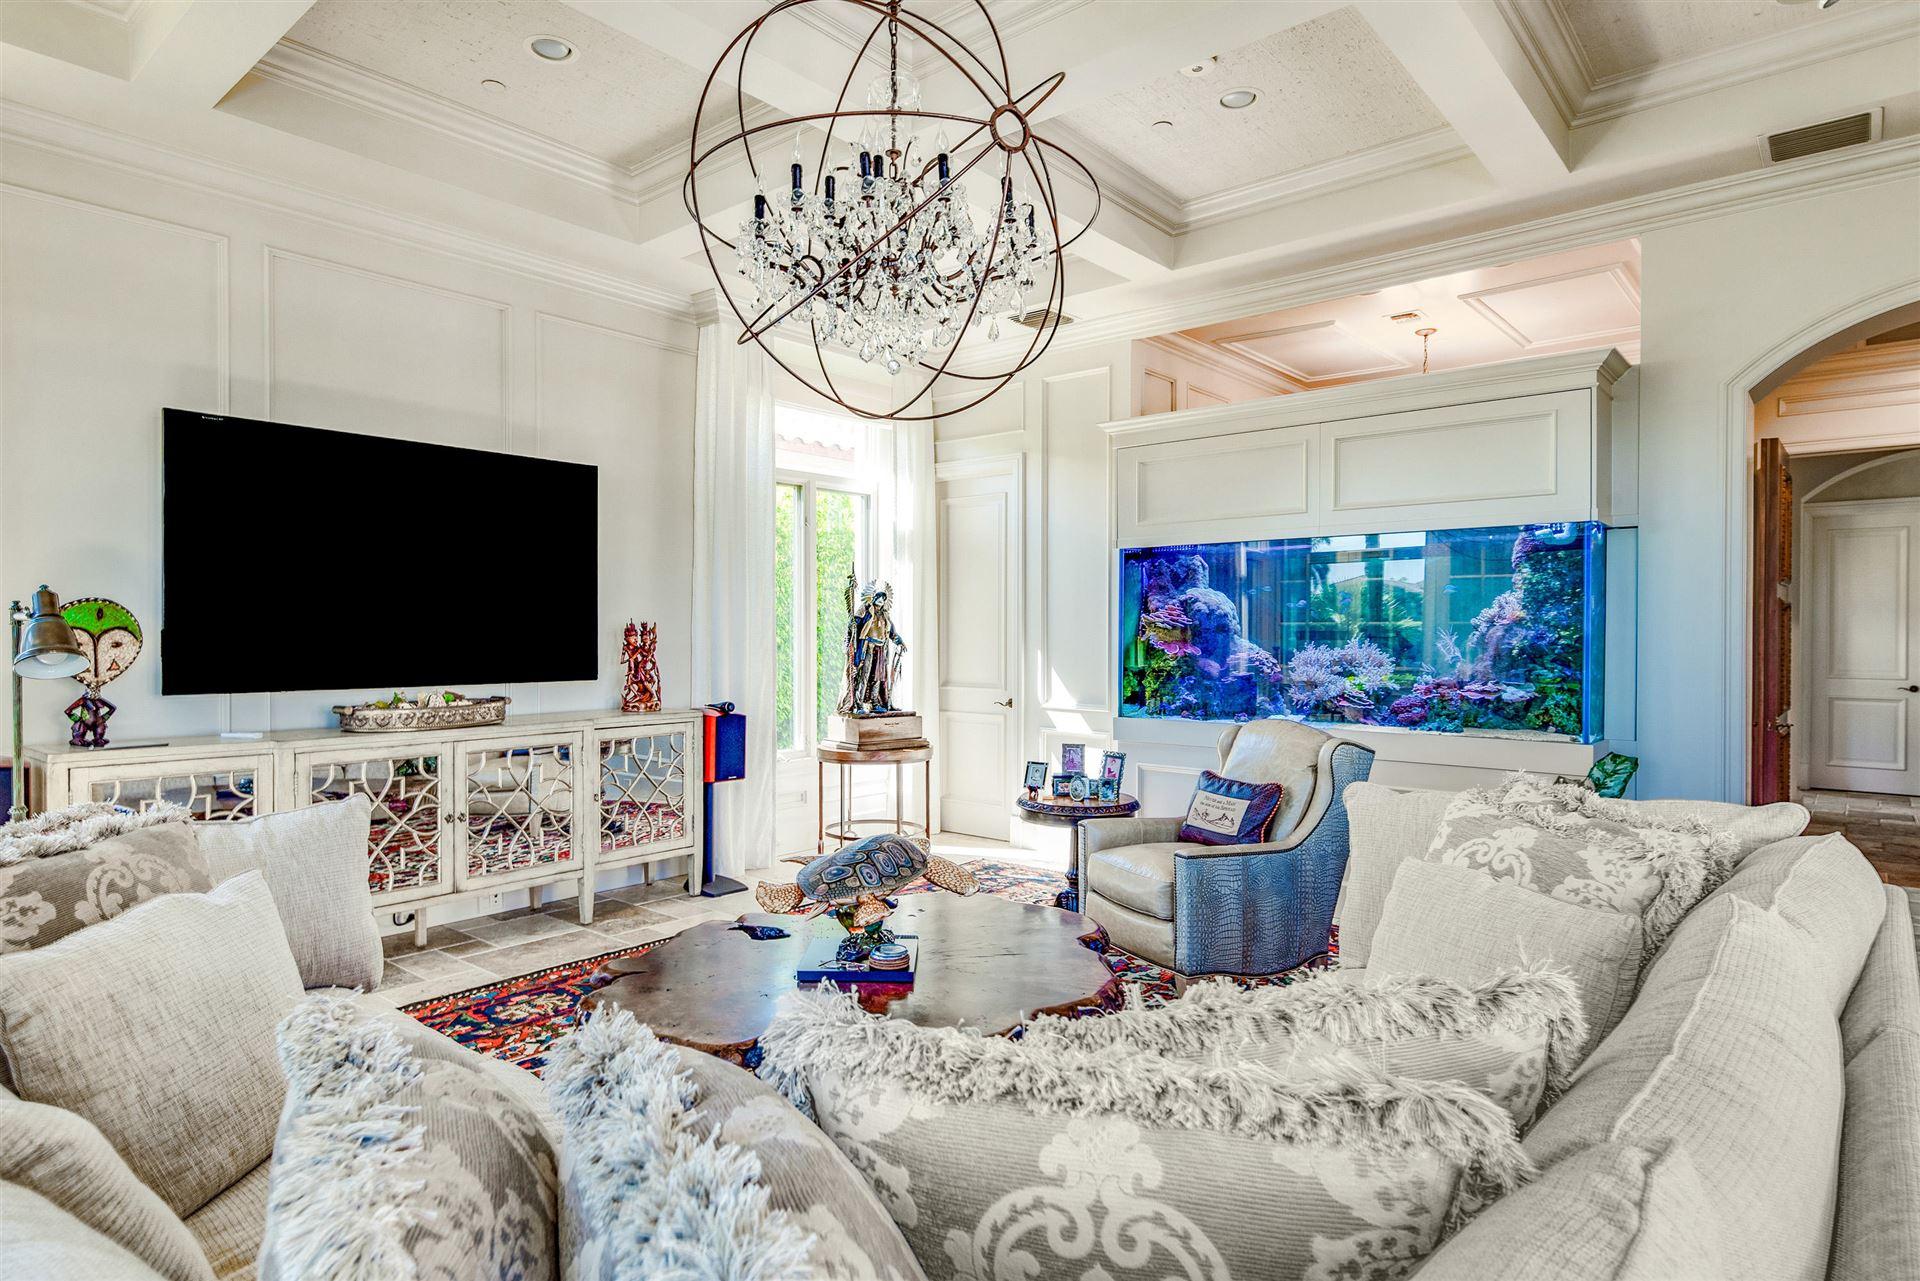 963 Evergreen, Delray Beach, FL, 33483, TROPIC ISLE 3RD SEC Home For Sale